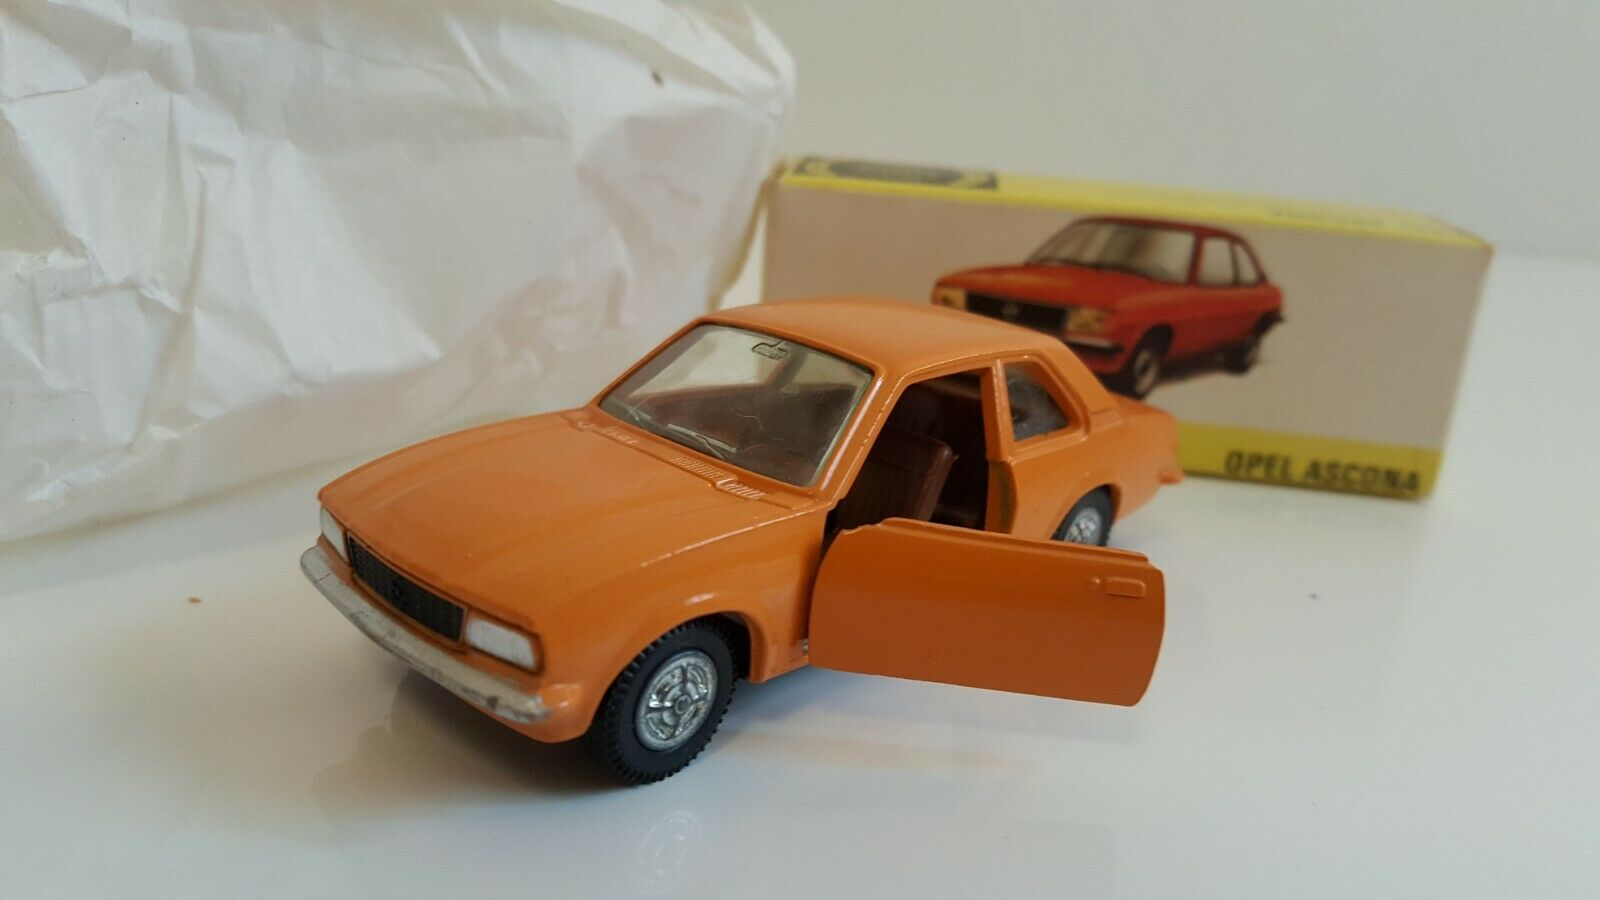 Dinky Toys - 011 543 - Opel Ascona en boîte d'origine MIB